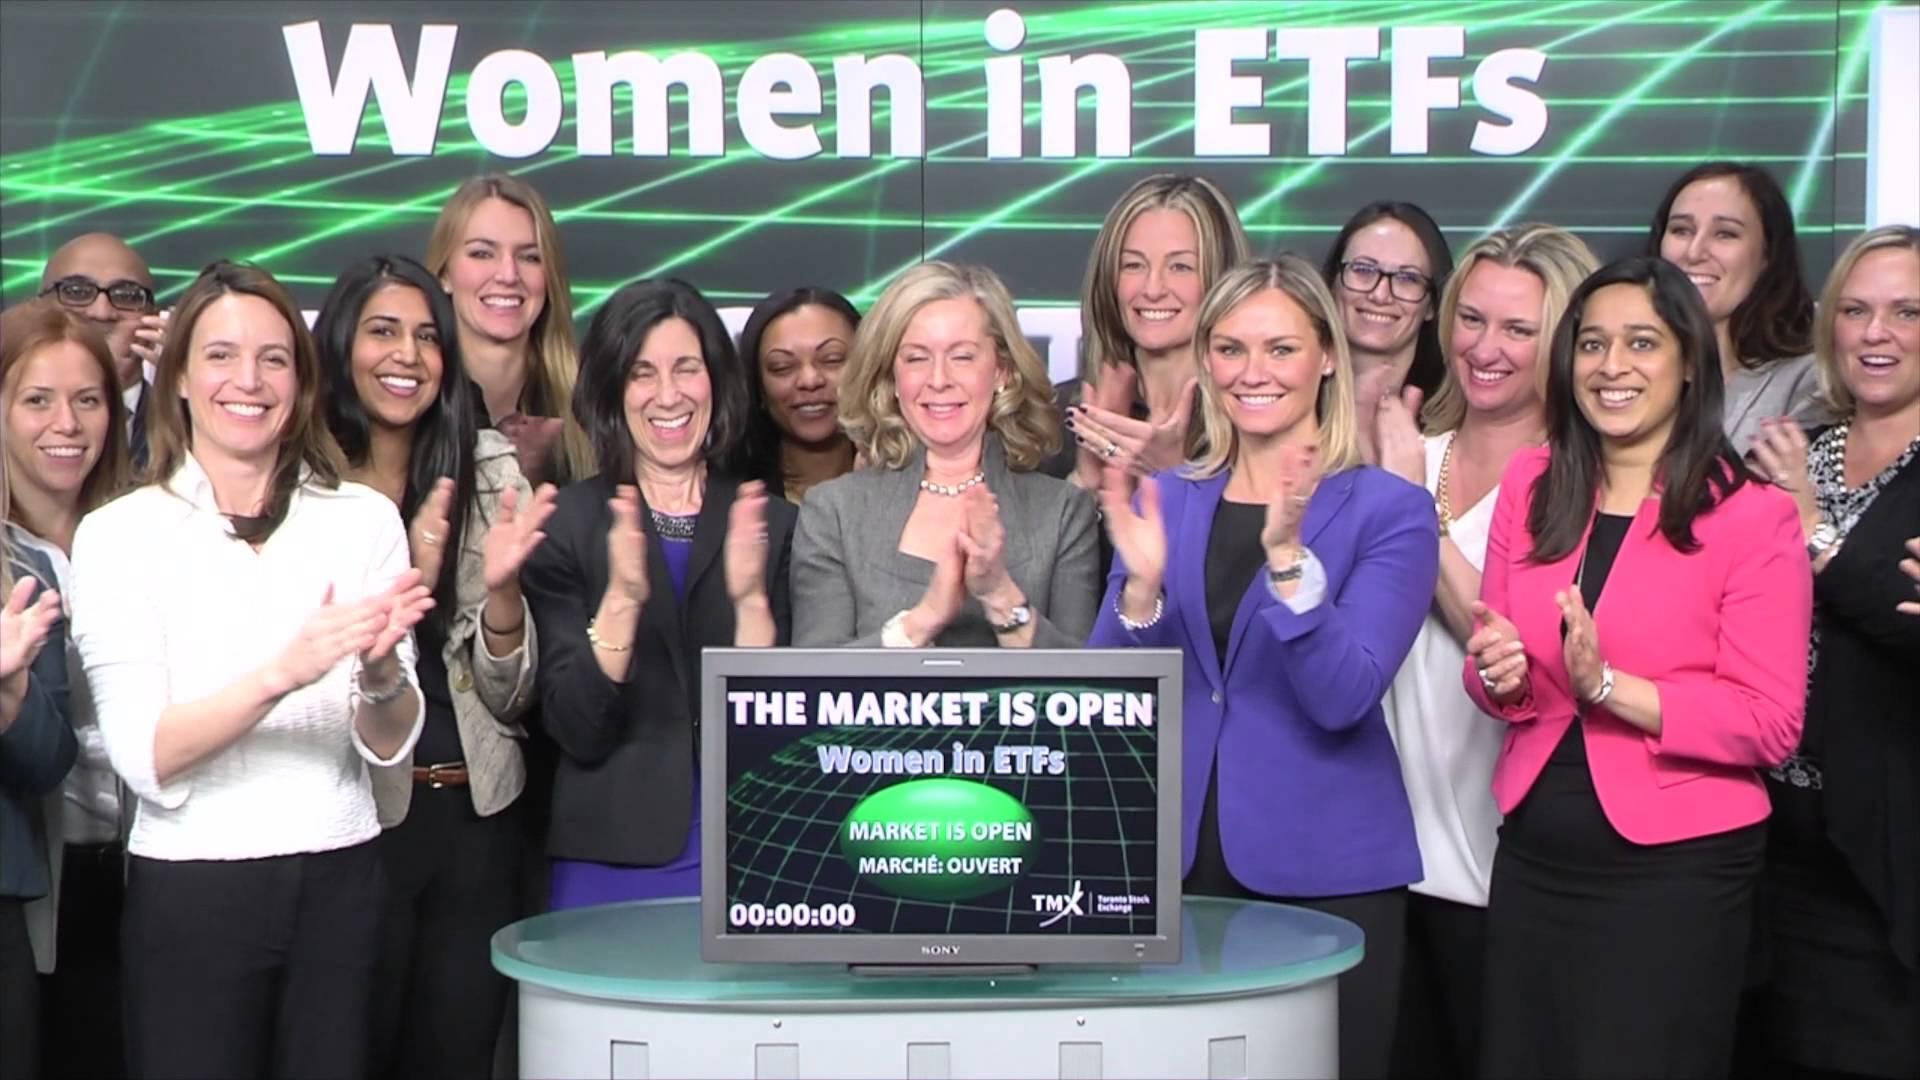 Women in ETFs opens Toronto Stock Exchange, March 6, 2015